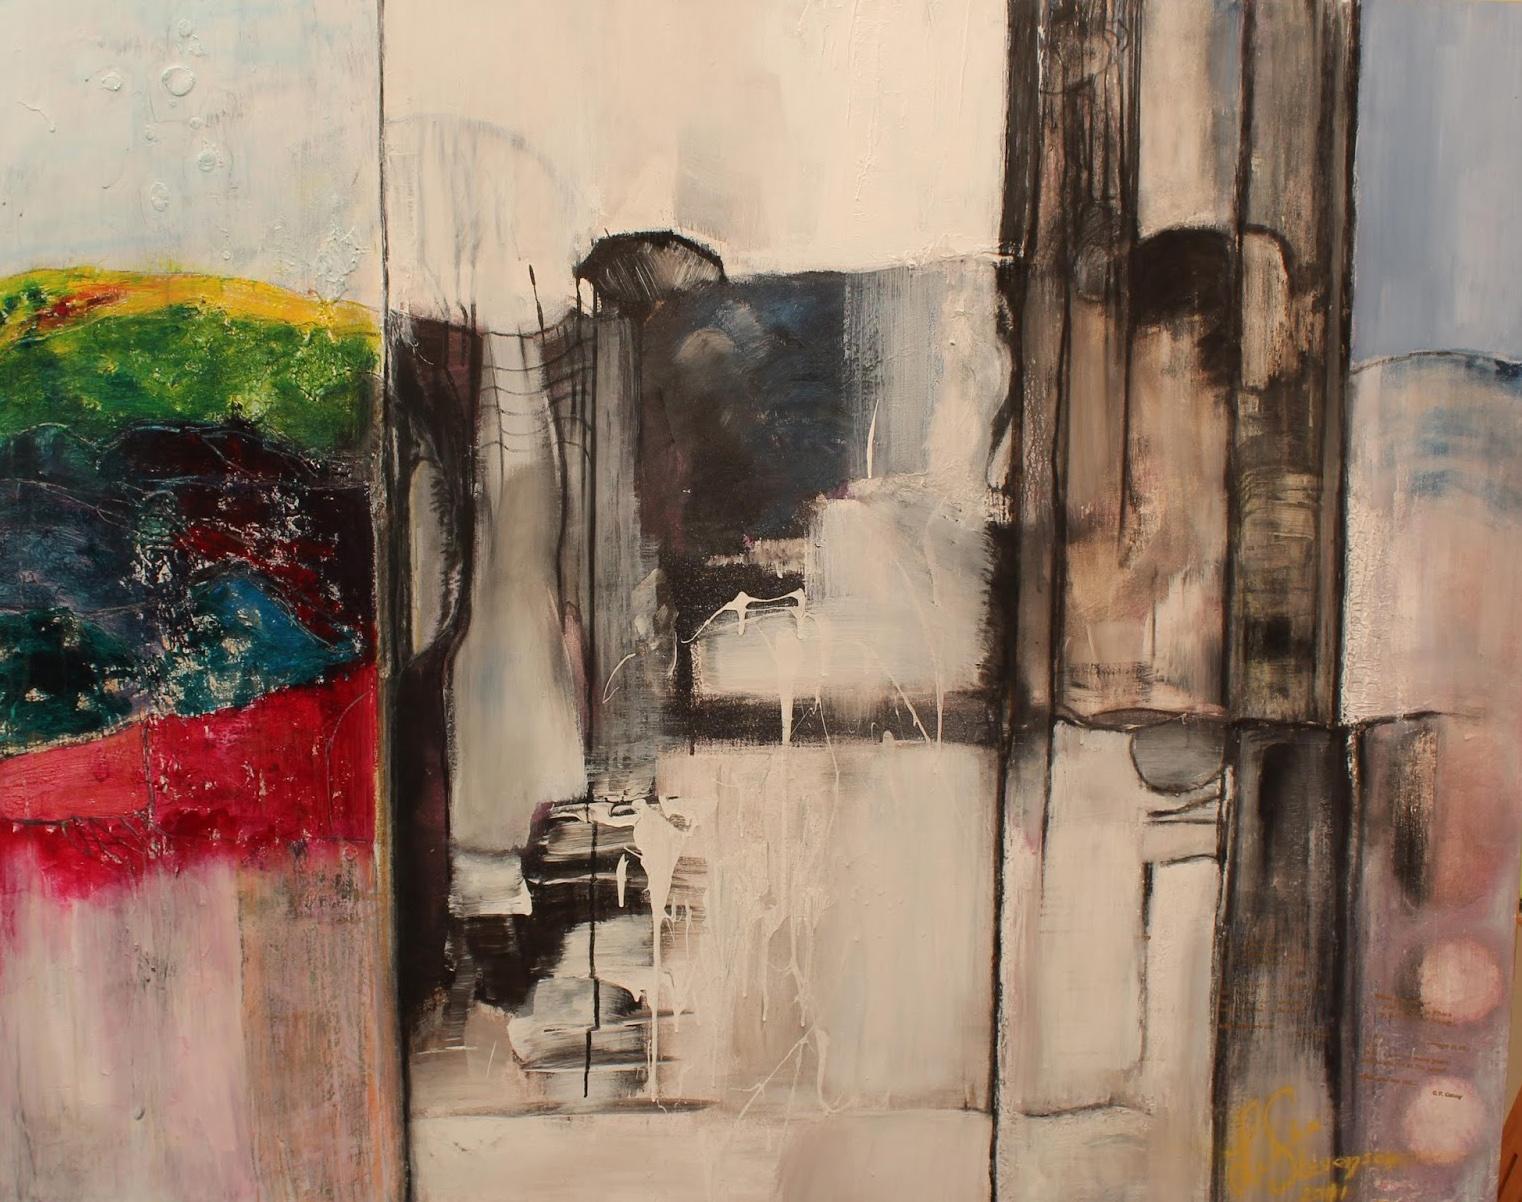 Ithaca - Painting by Linda Stevenson